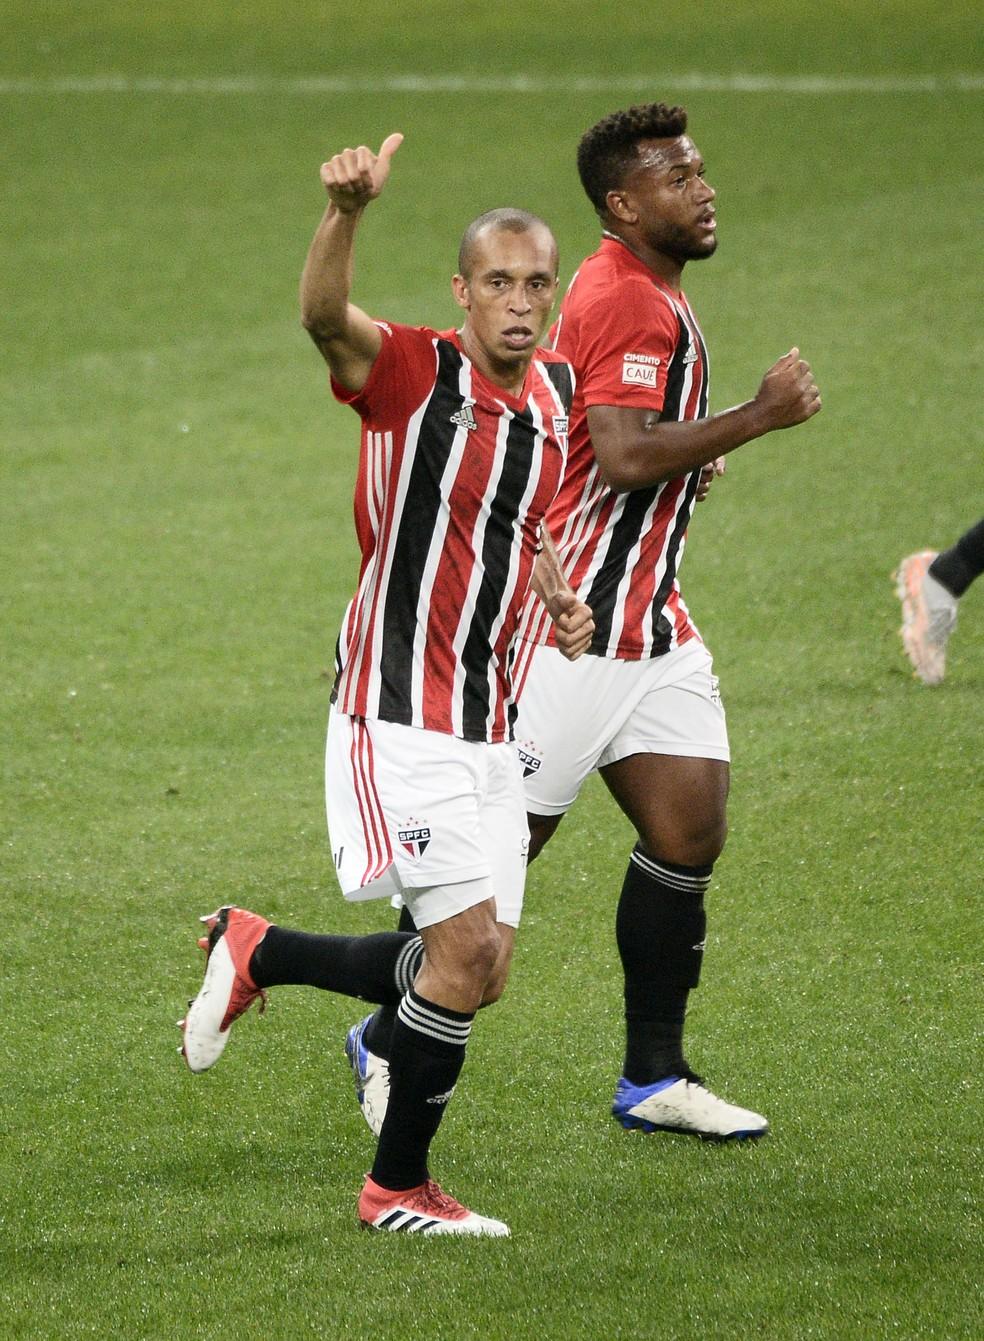 Miranda comemora o gol no clássico contra o Corinthians — Foto: Marcos Ribolli